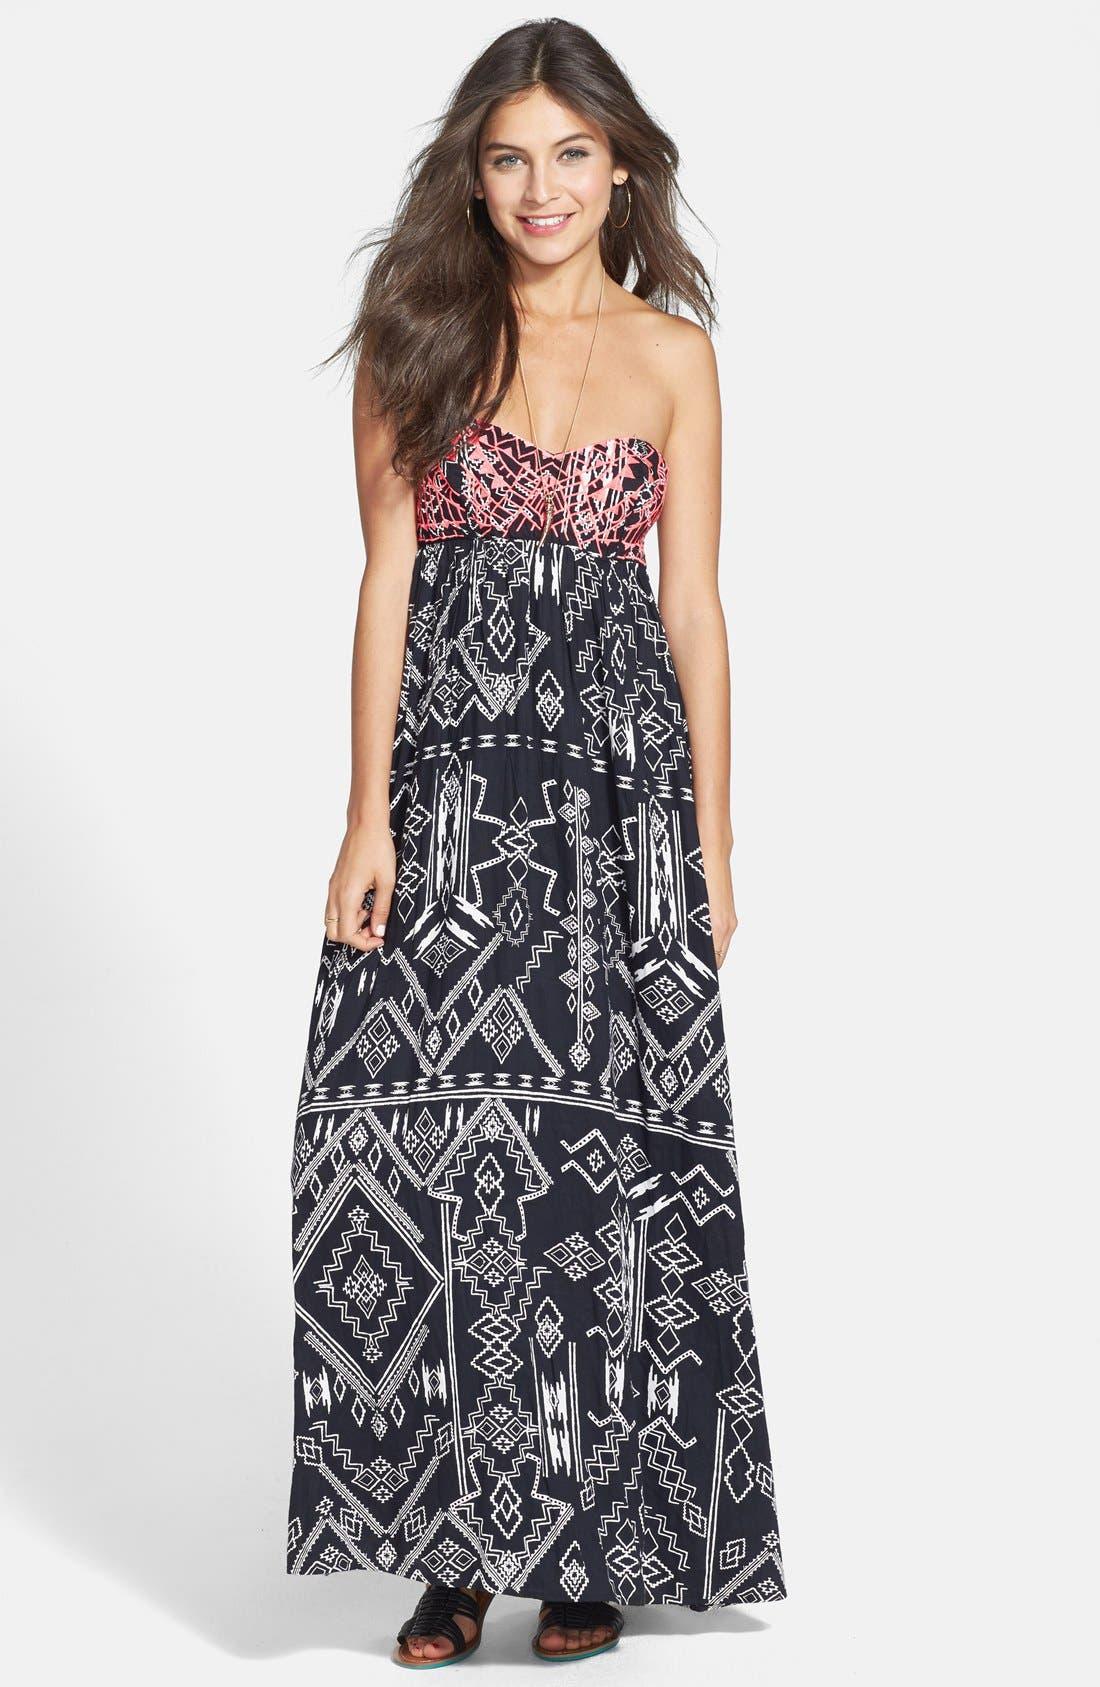 Alternate Image 1 Selected - Billabong 'Dreamed of You' Print Bandeau Maxi Dress (Juniors)